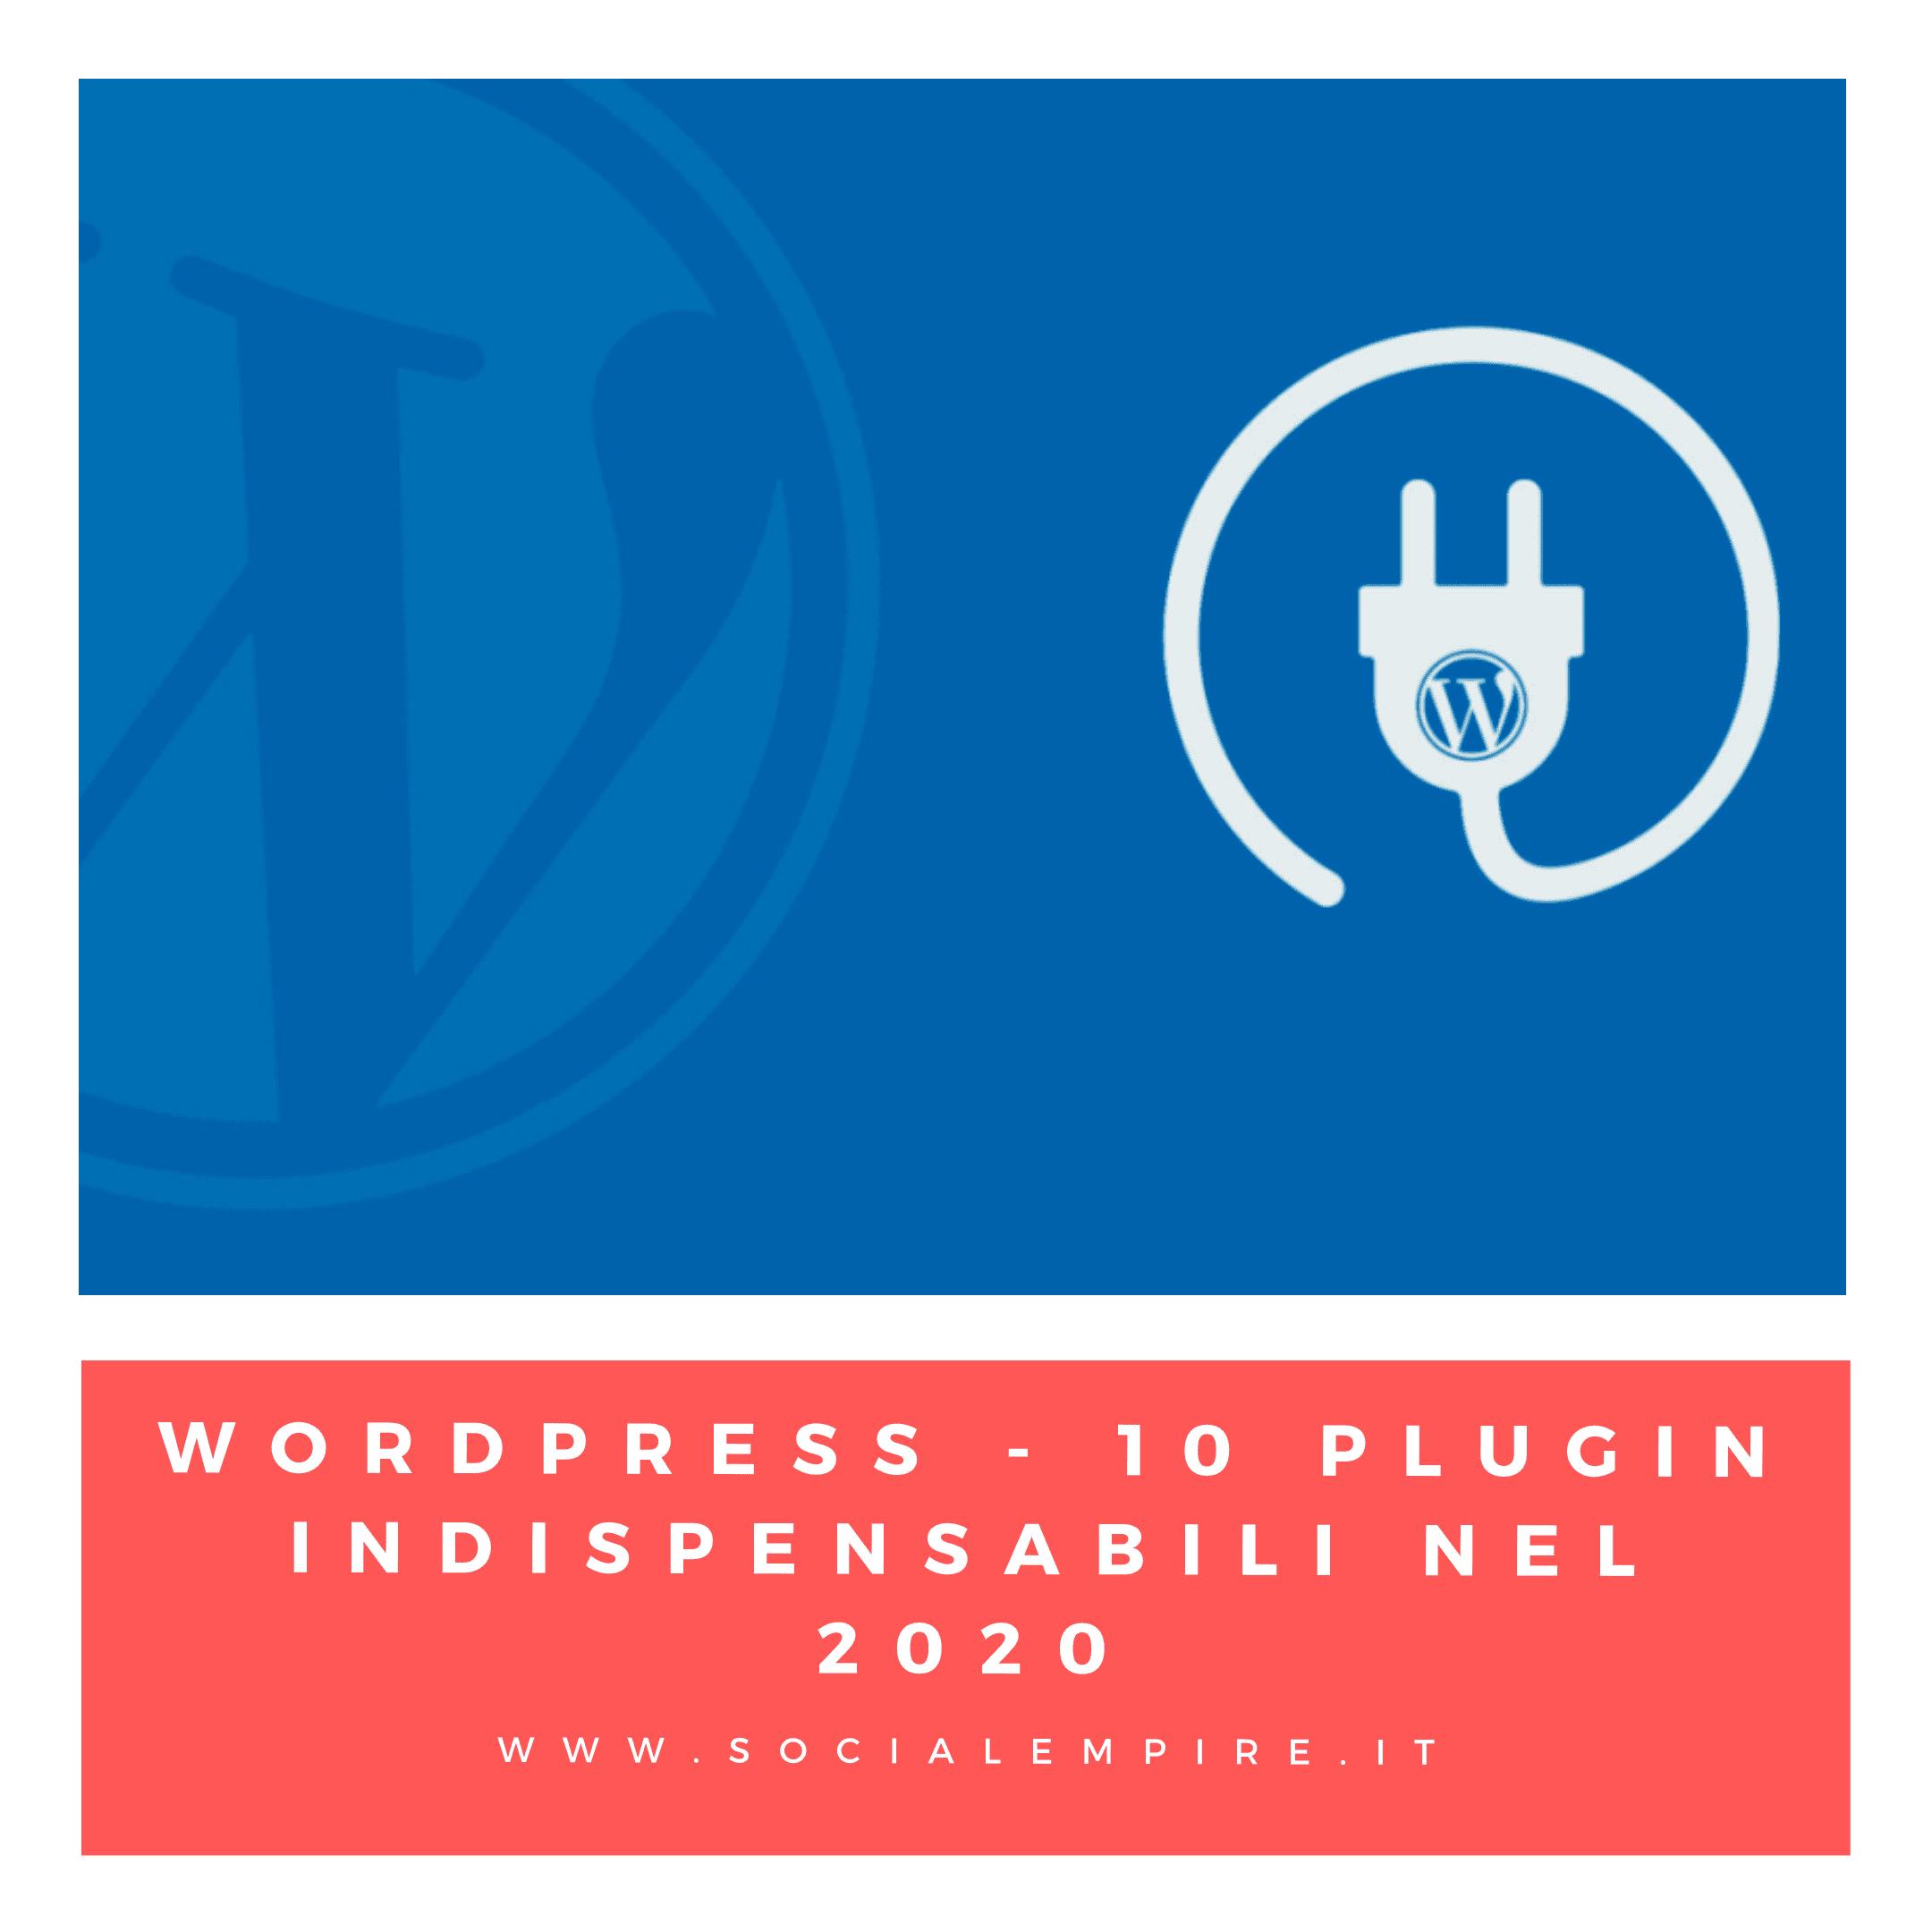 Plugin indispensabili Wordpress